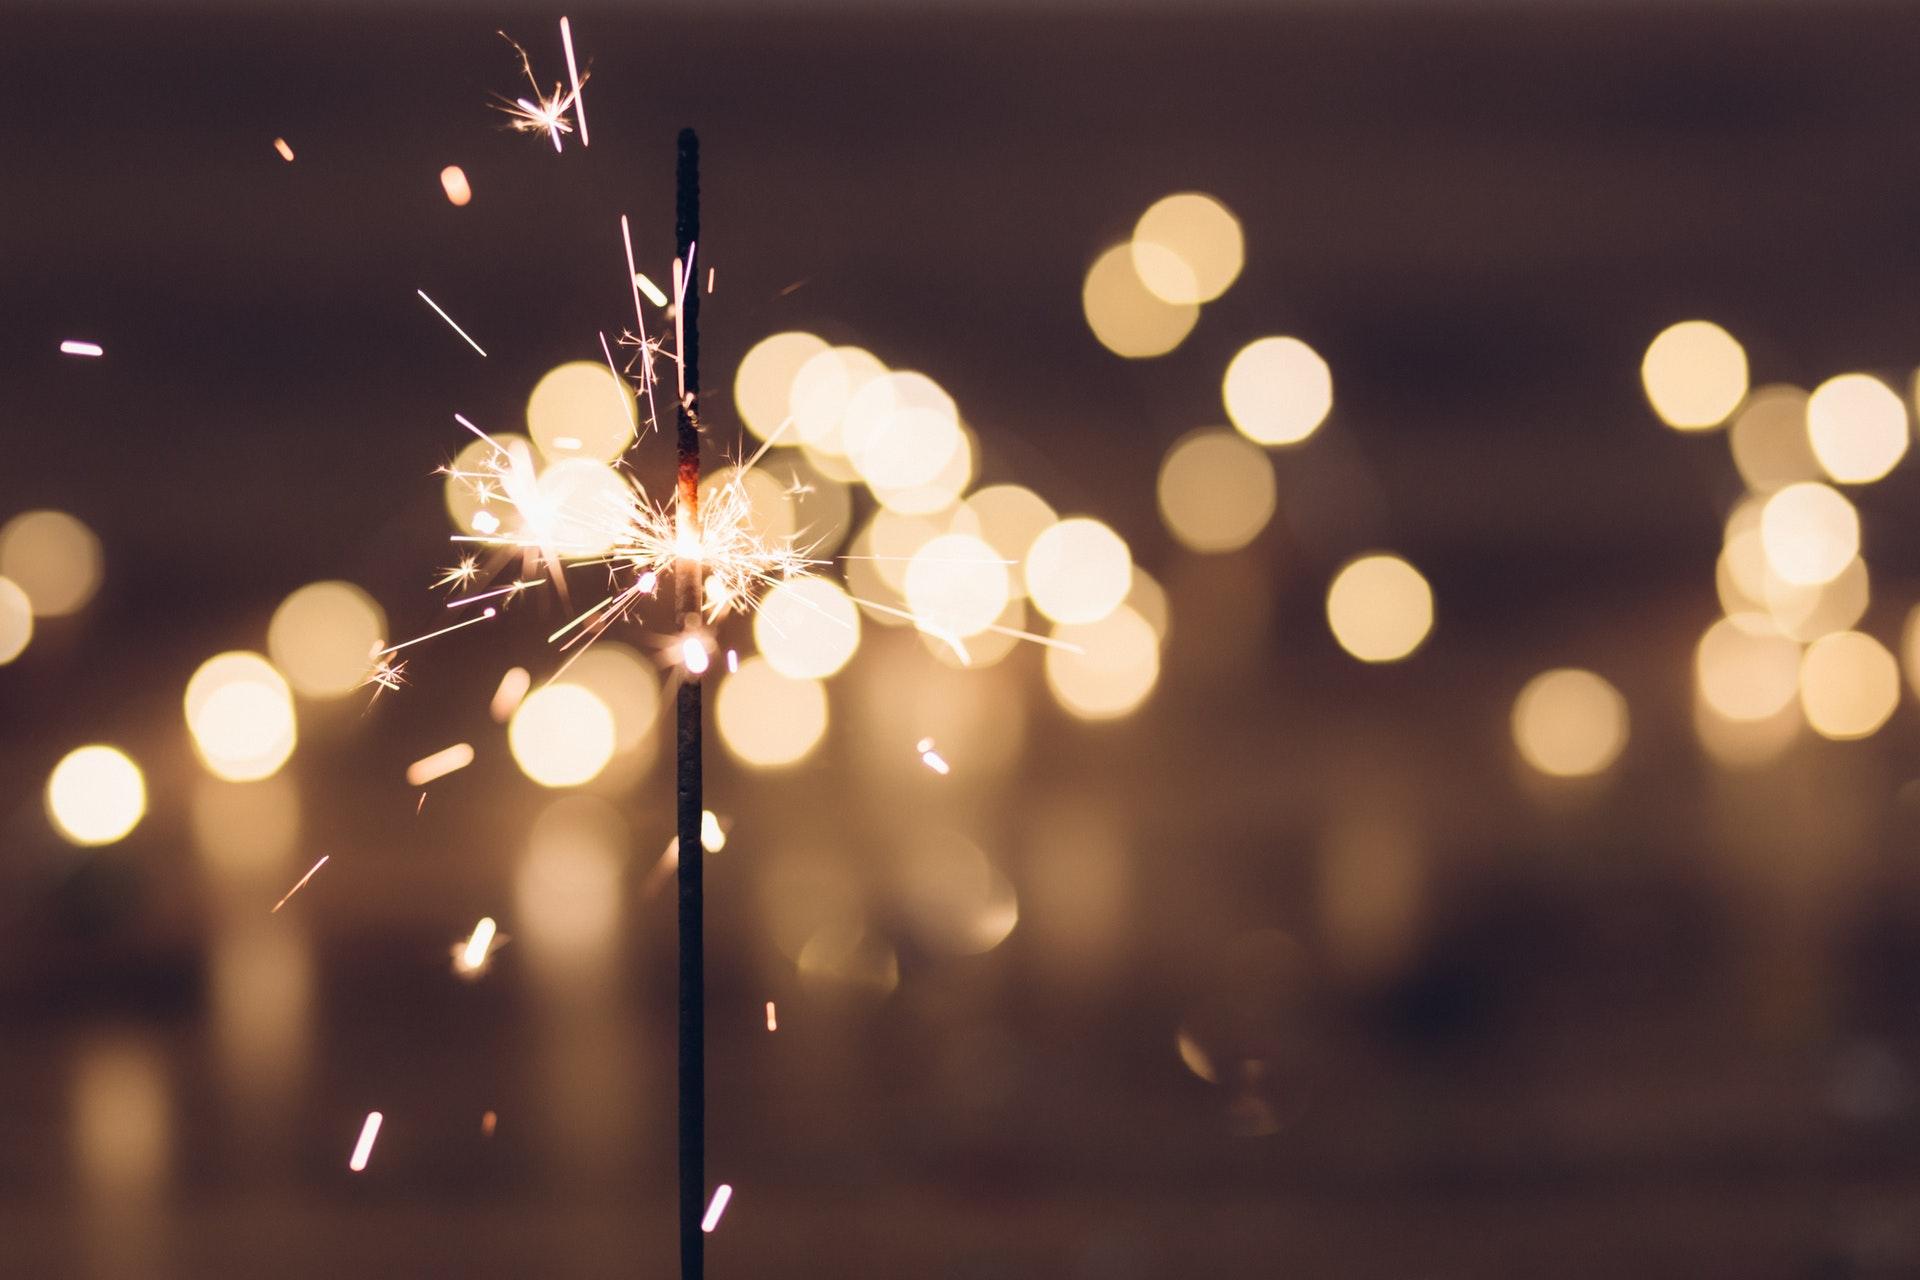 Sparkler -- Celebration